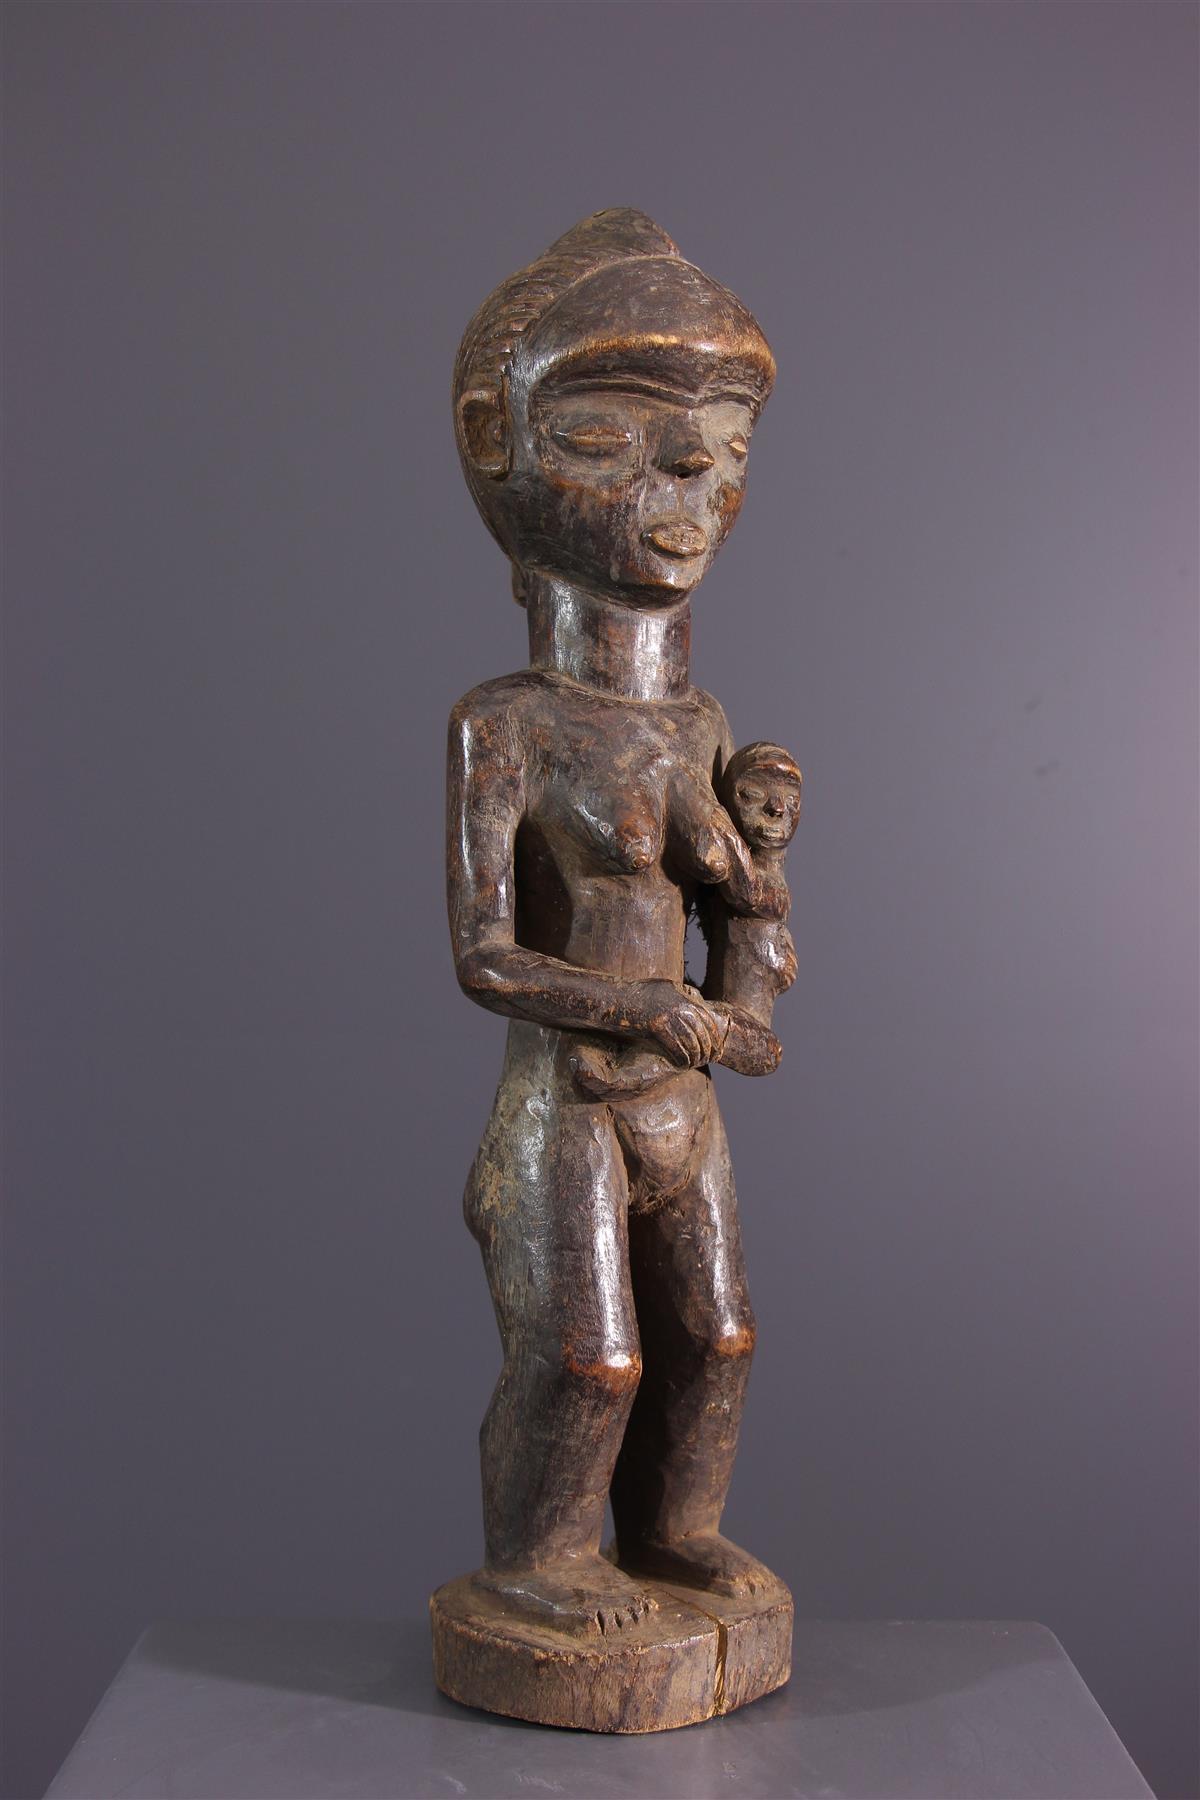 Mbala standbeeld - Afrikaanse kunst